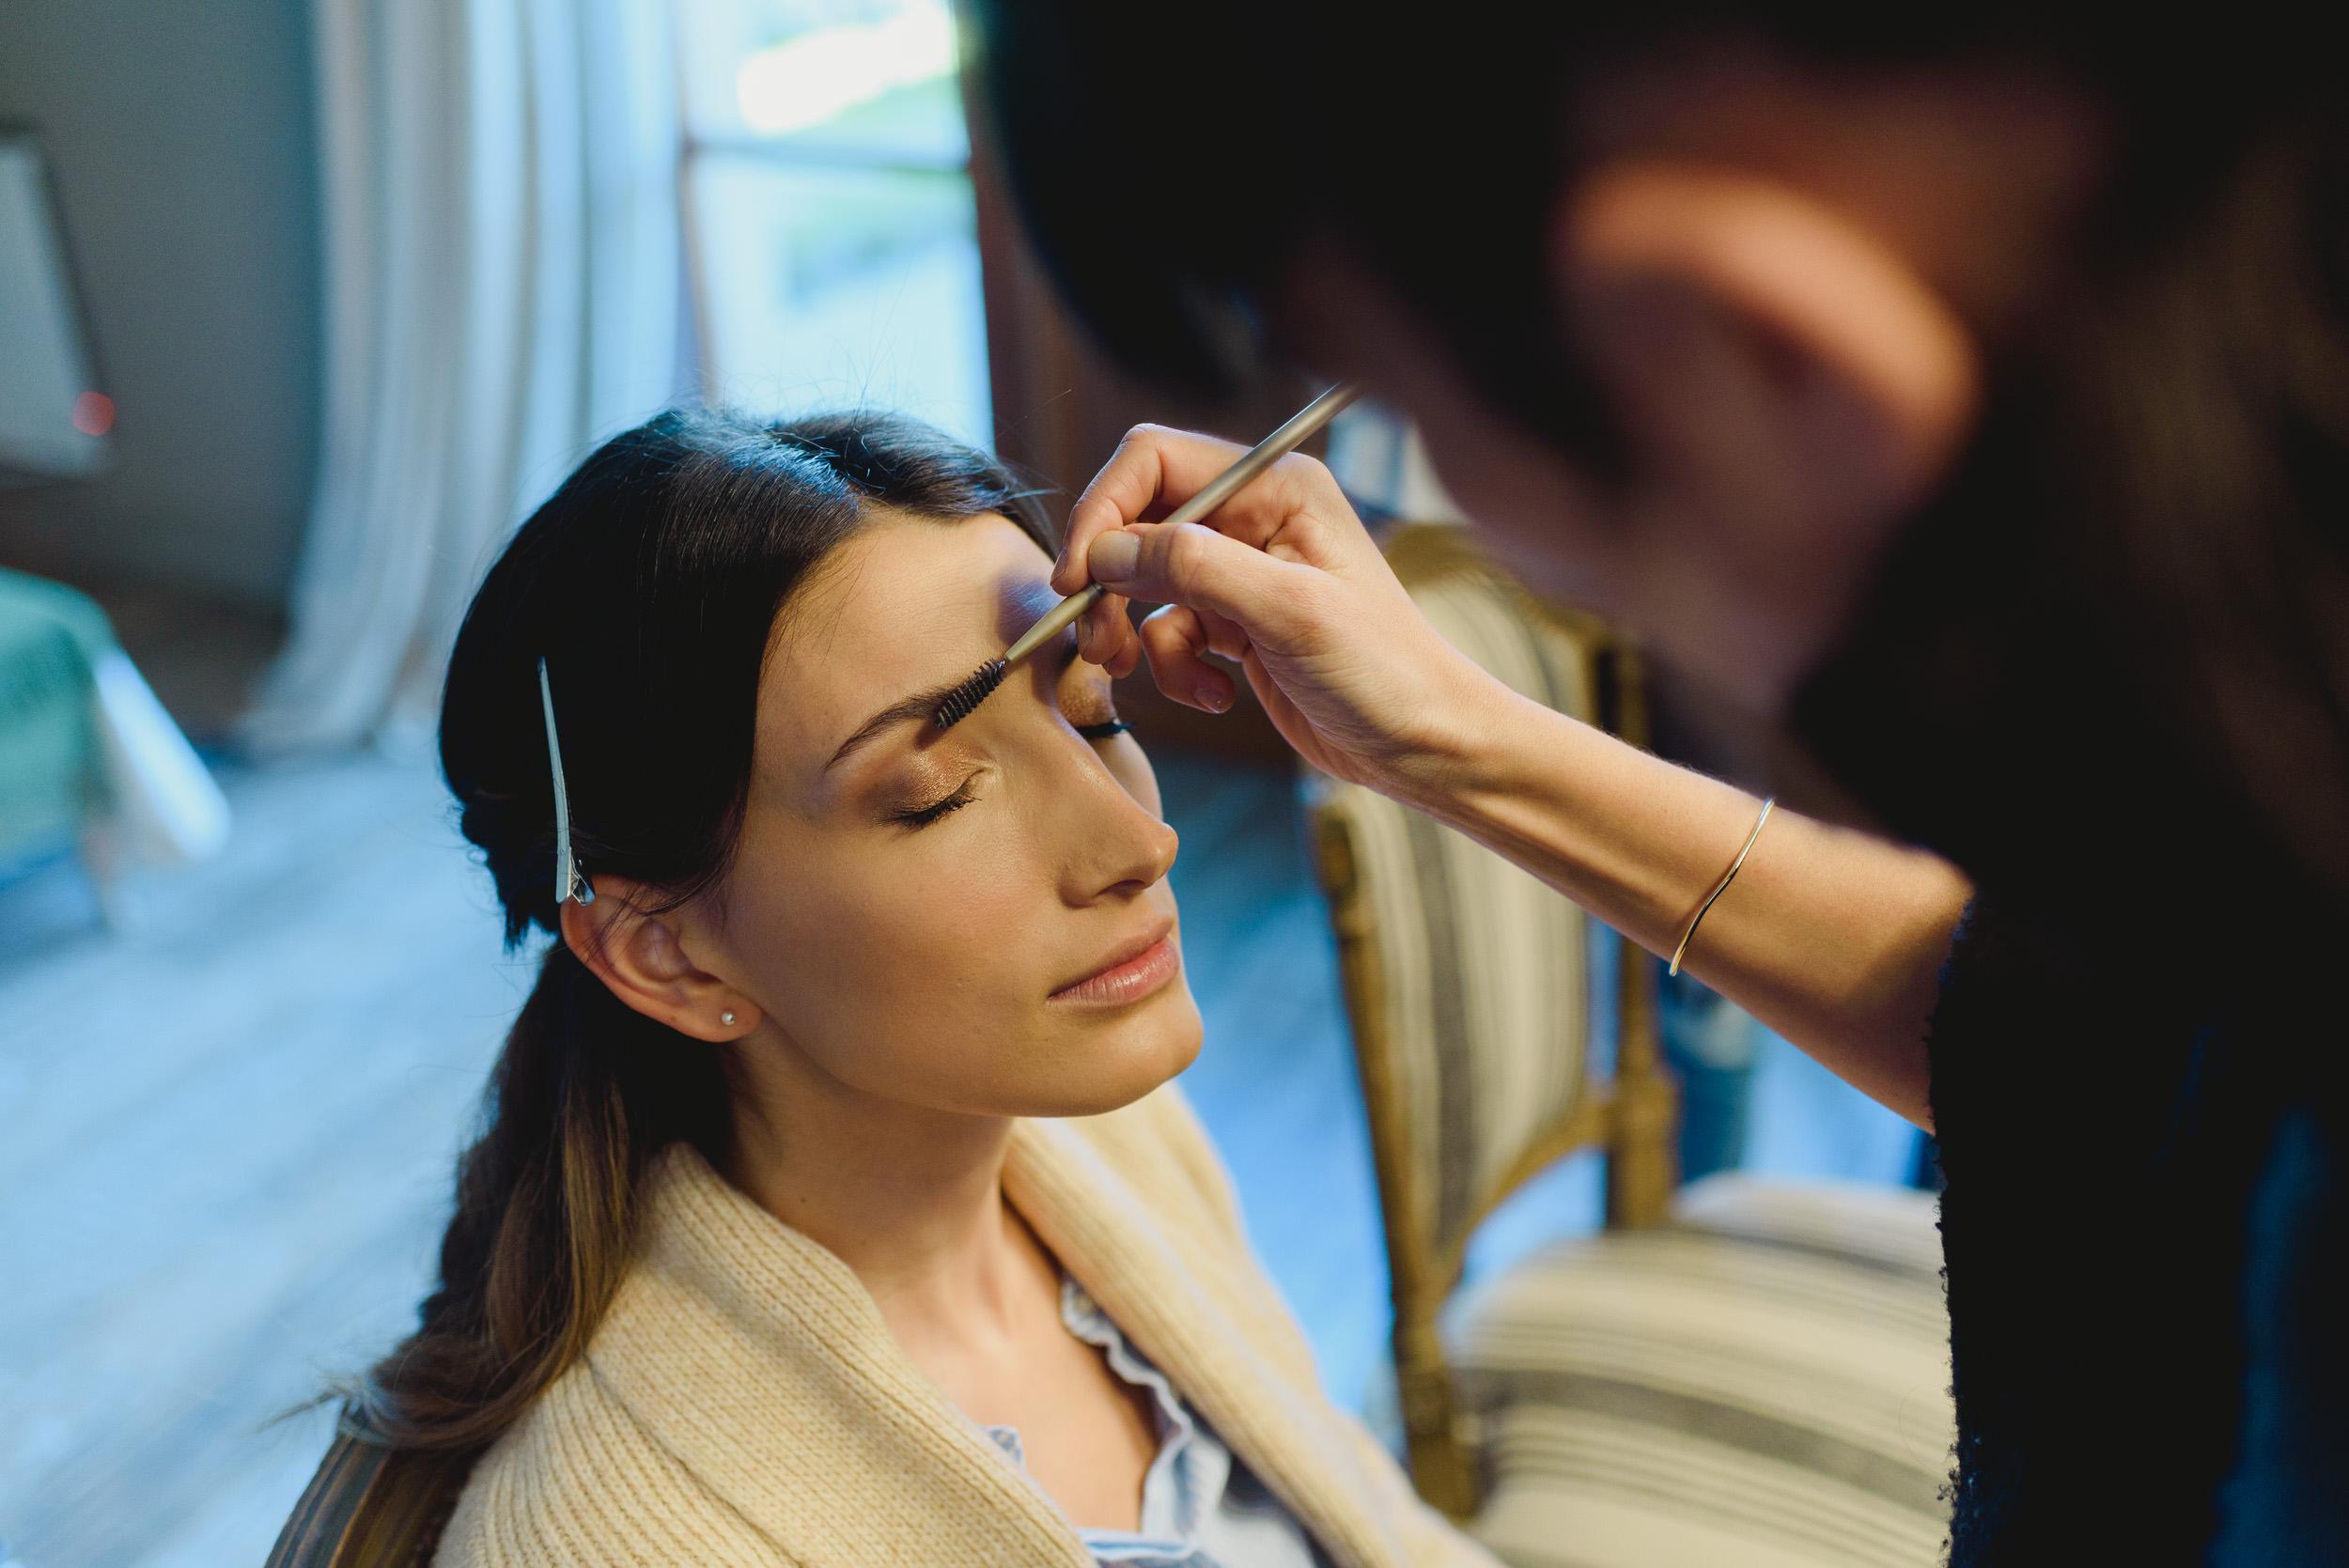 Vicky Lopez Saubidet Make up & Hair02.JPG